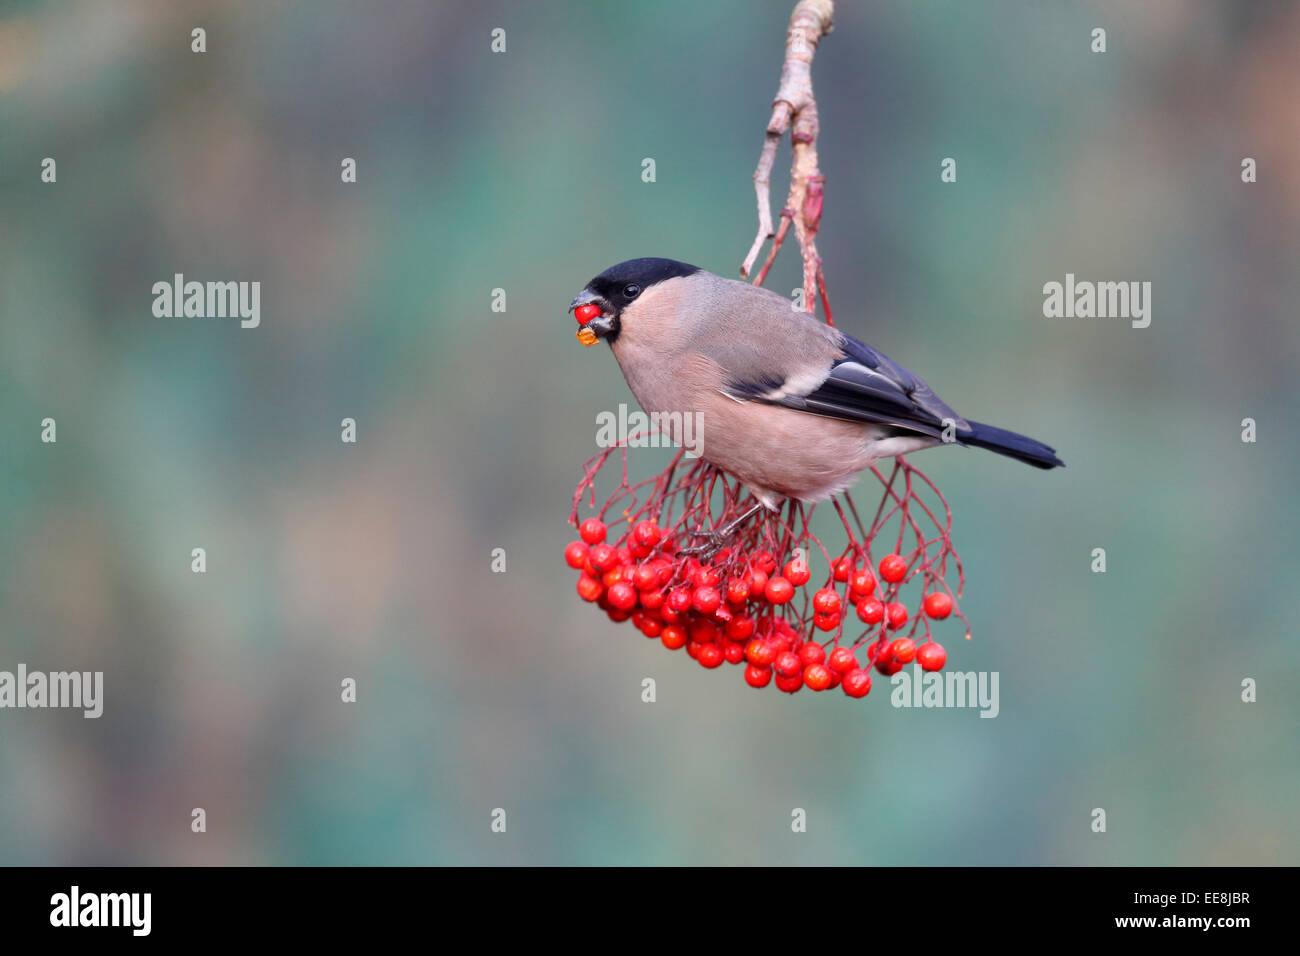 Bullfinch, Pyrrhula pyrrhula, single female on red berries, Warwickshire, January 2015 Stock Photo